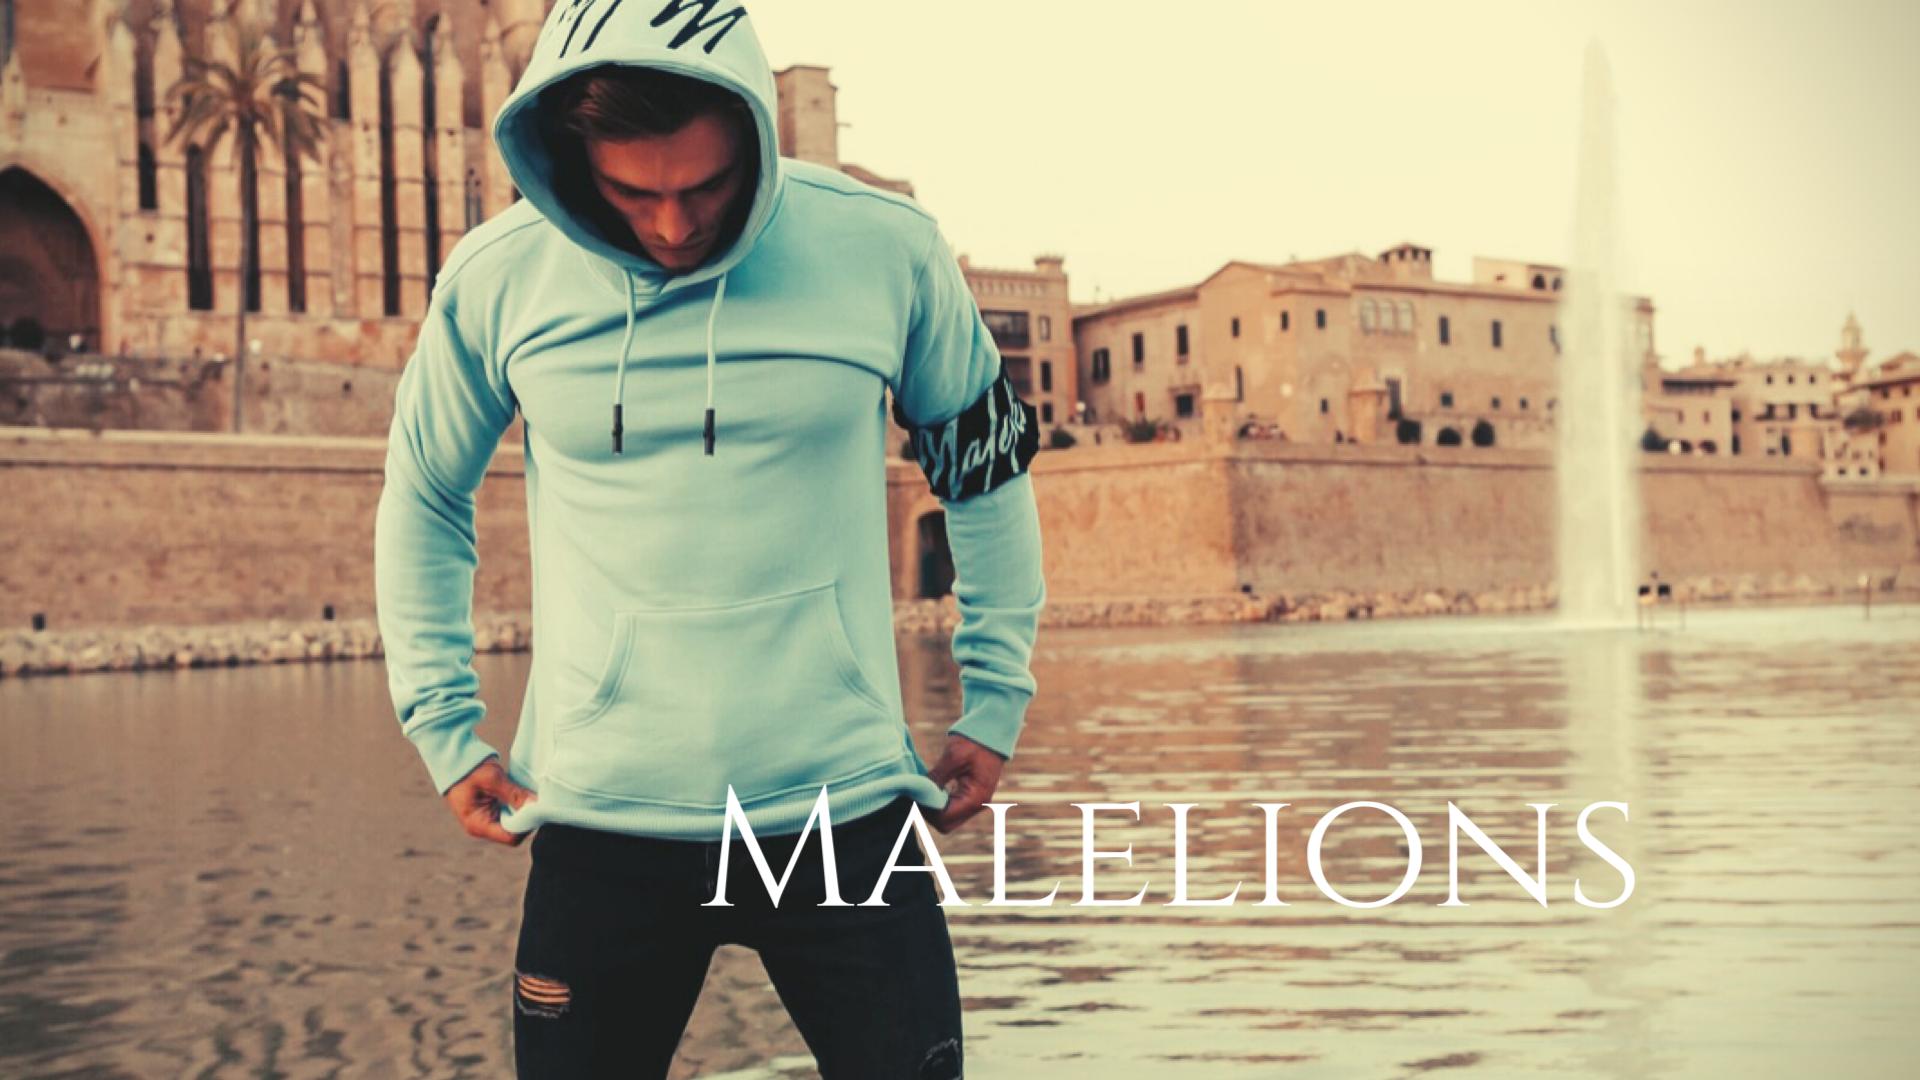 malelions captain hoodie